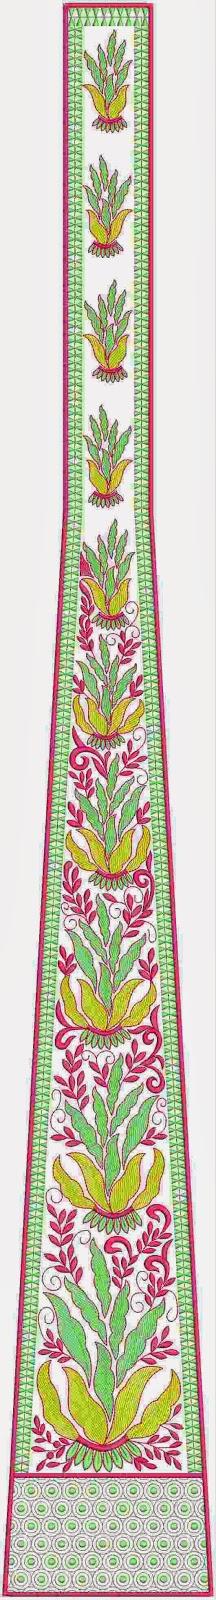 Italië mode borduurwerk kali appliekwerk